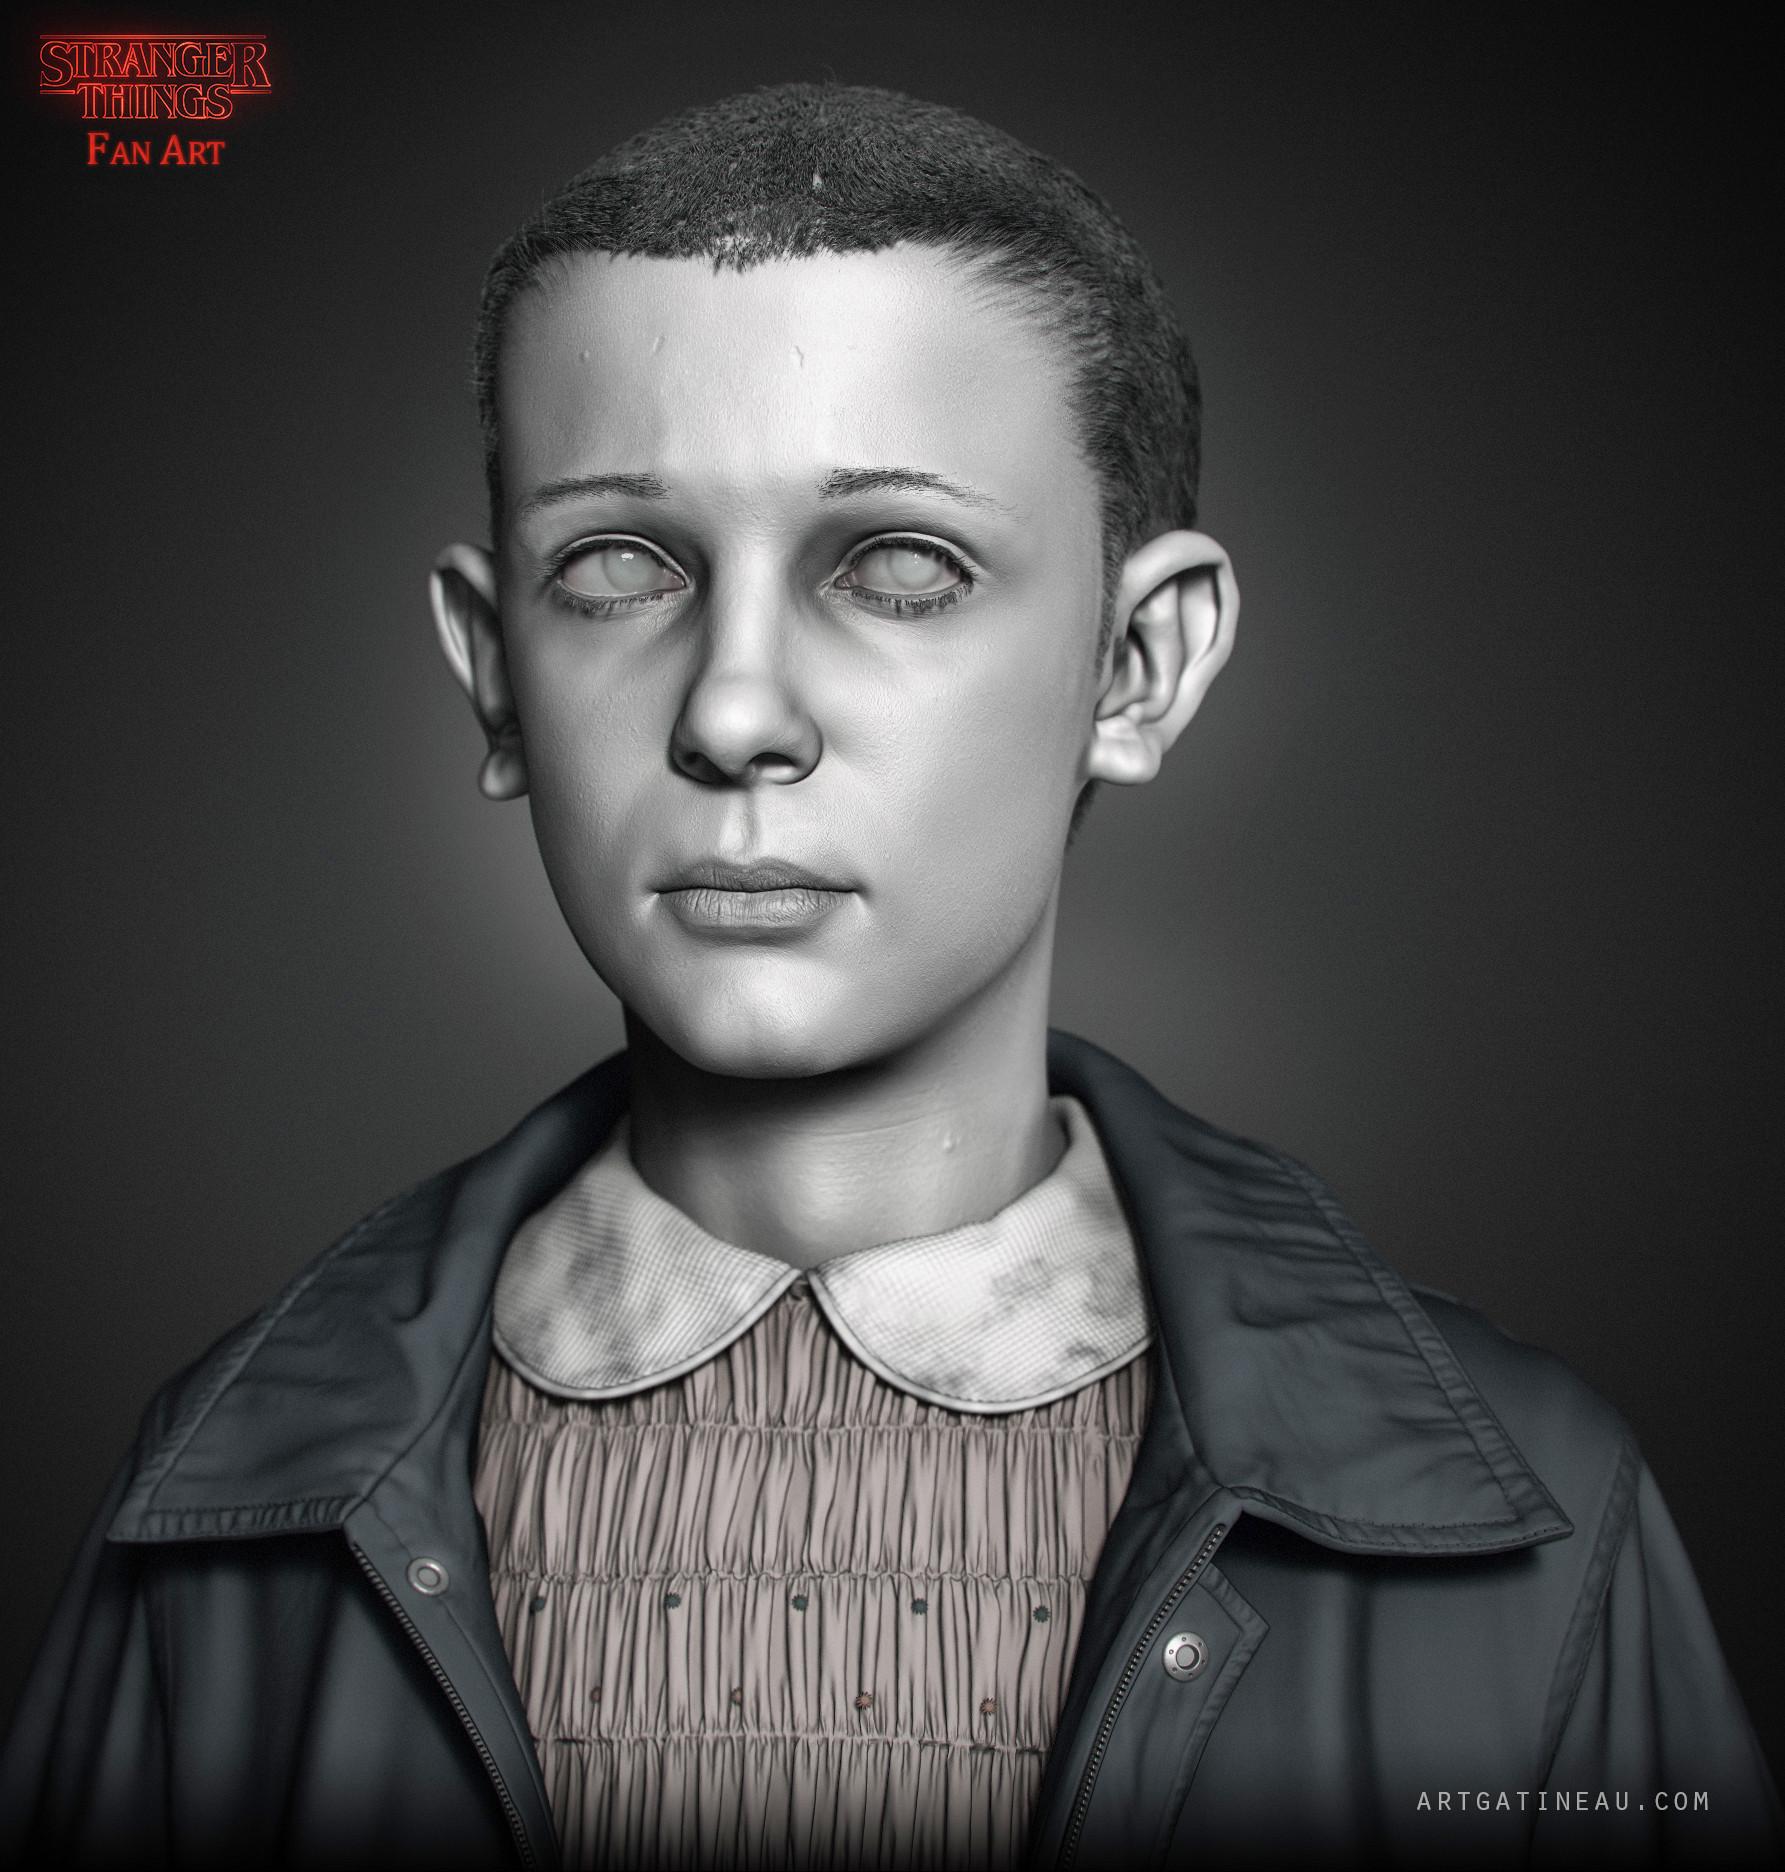 Arthur gatineau final